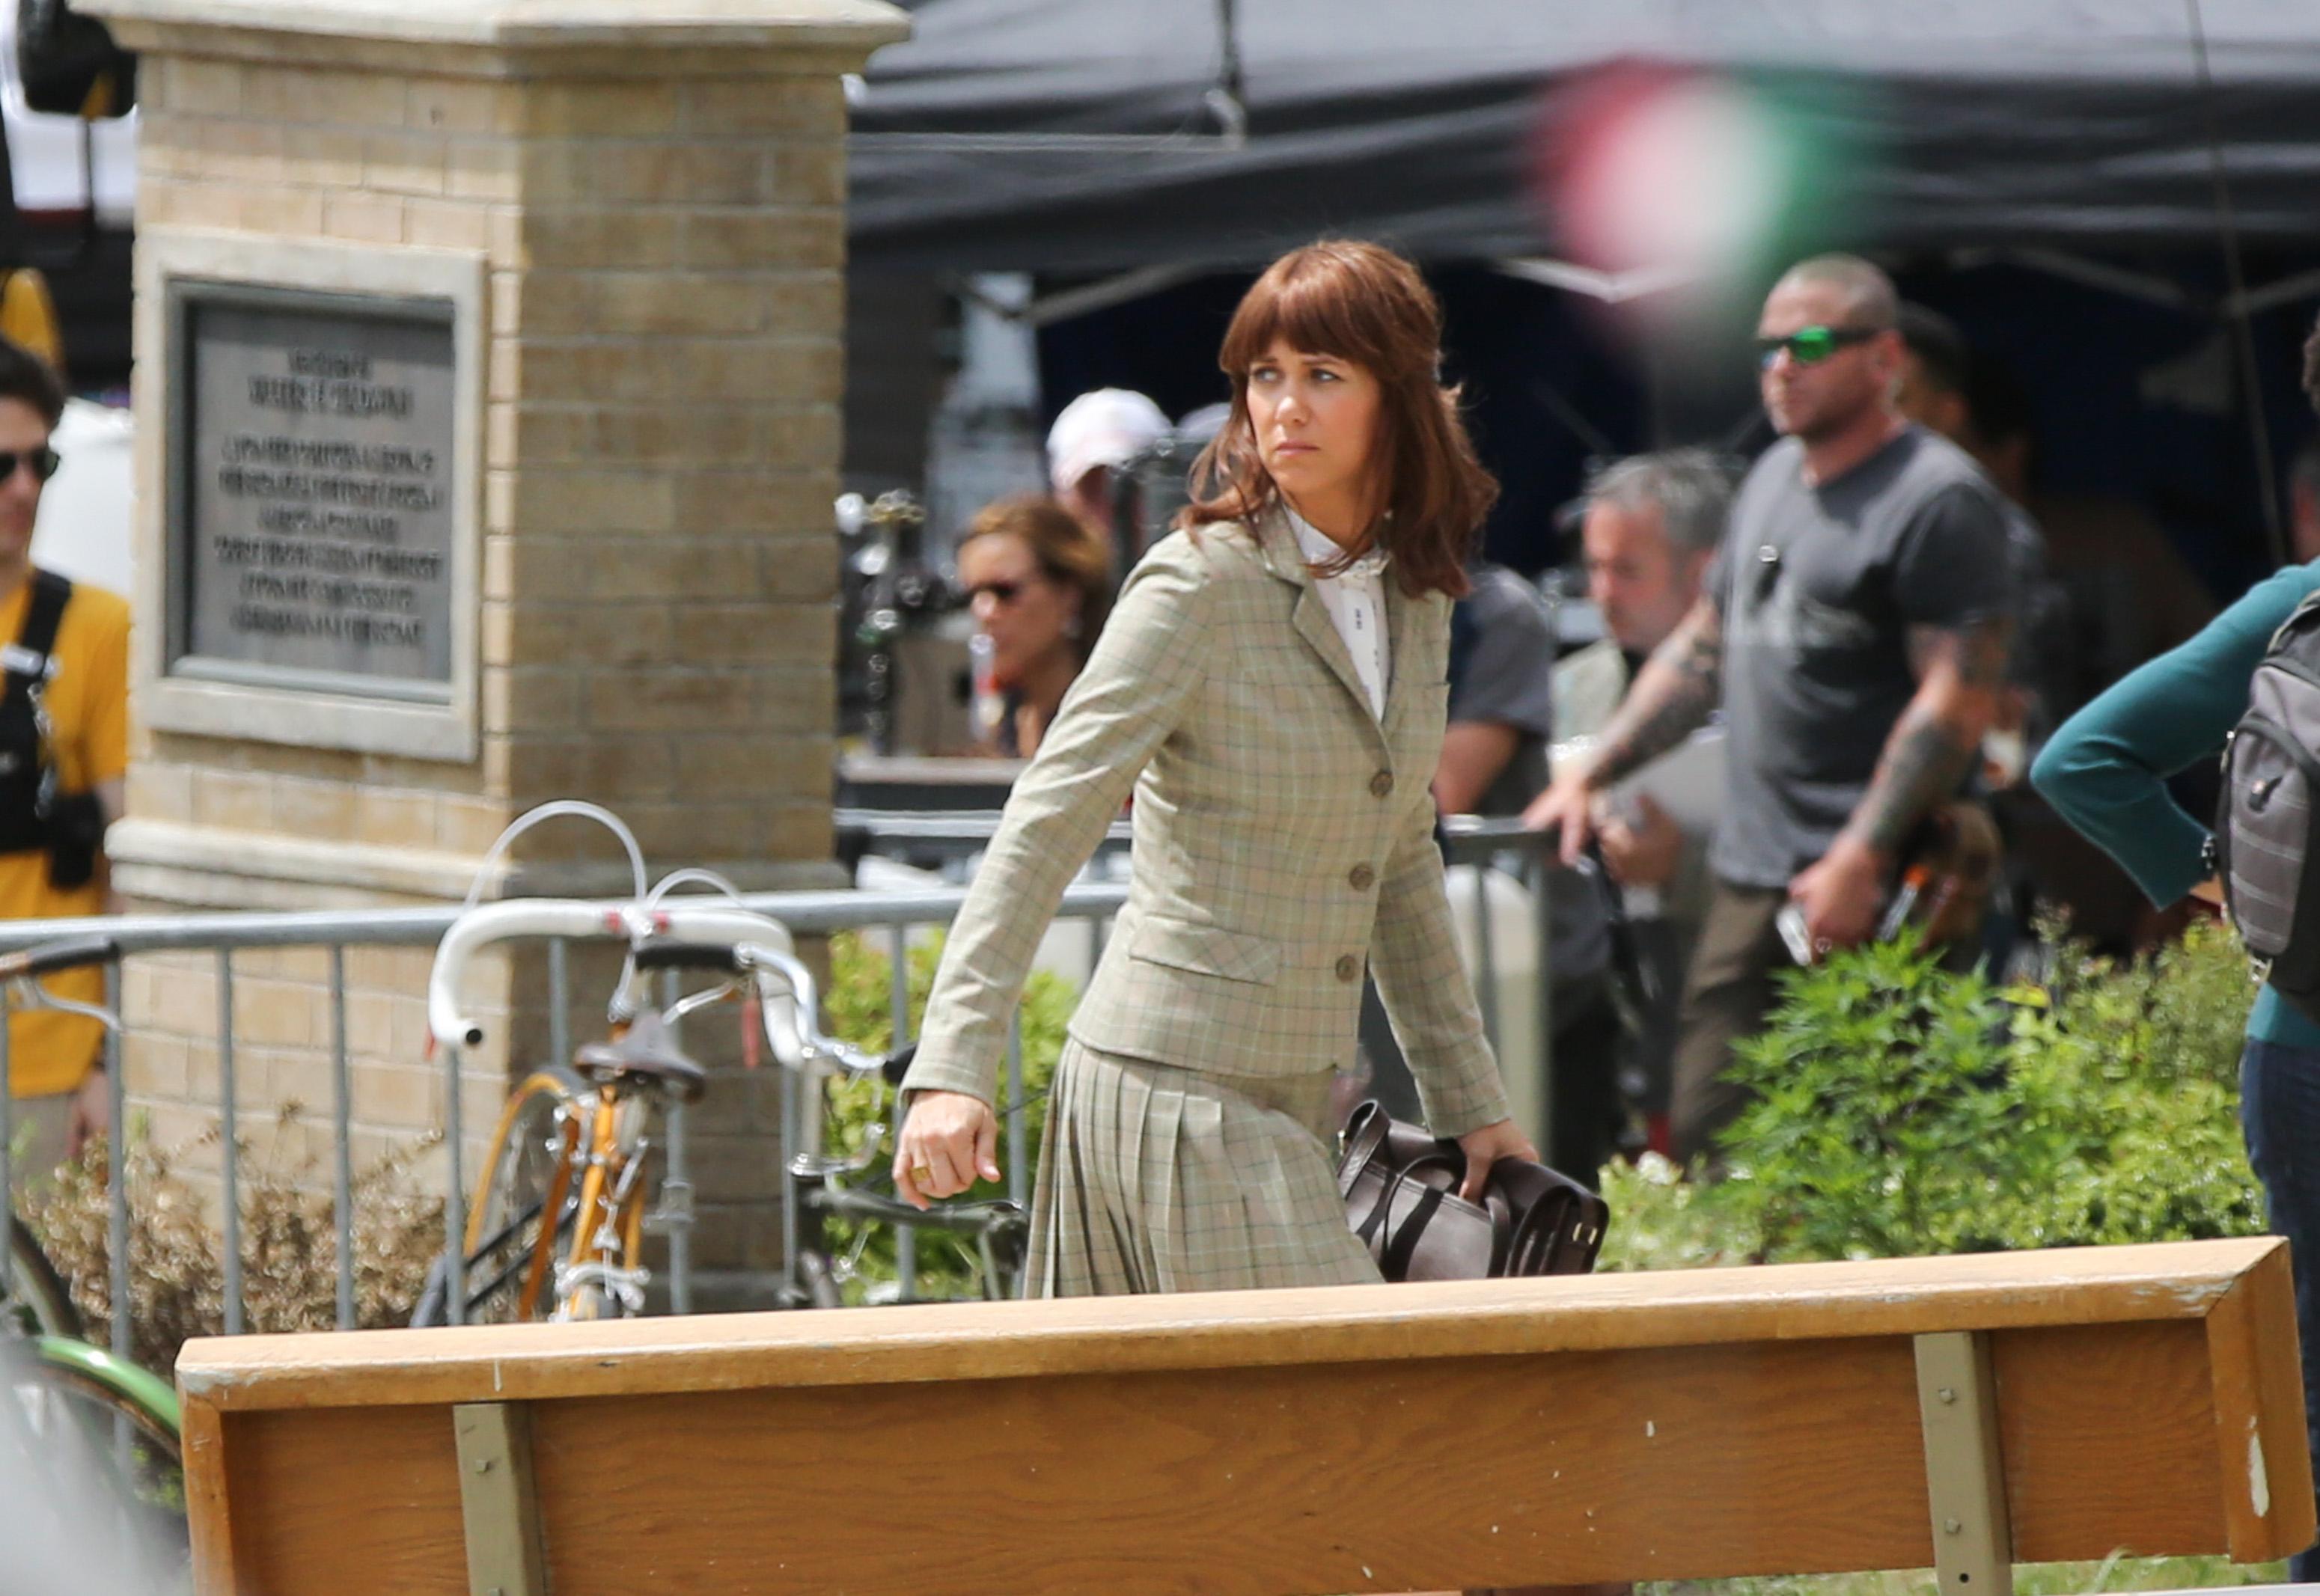 Kristen Wiig is seen on the set of 'Ghostbusters' on June 18, 2015 in Boston, Massachusetts.